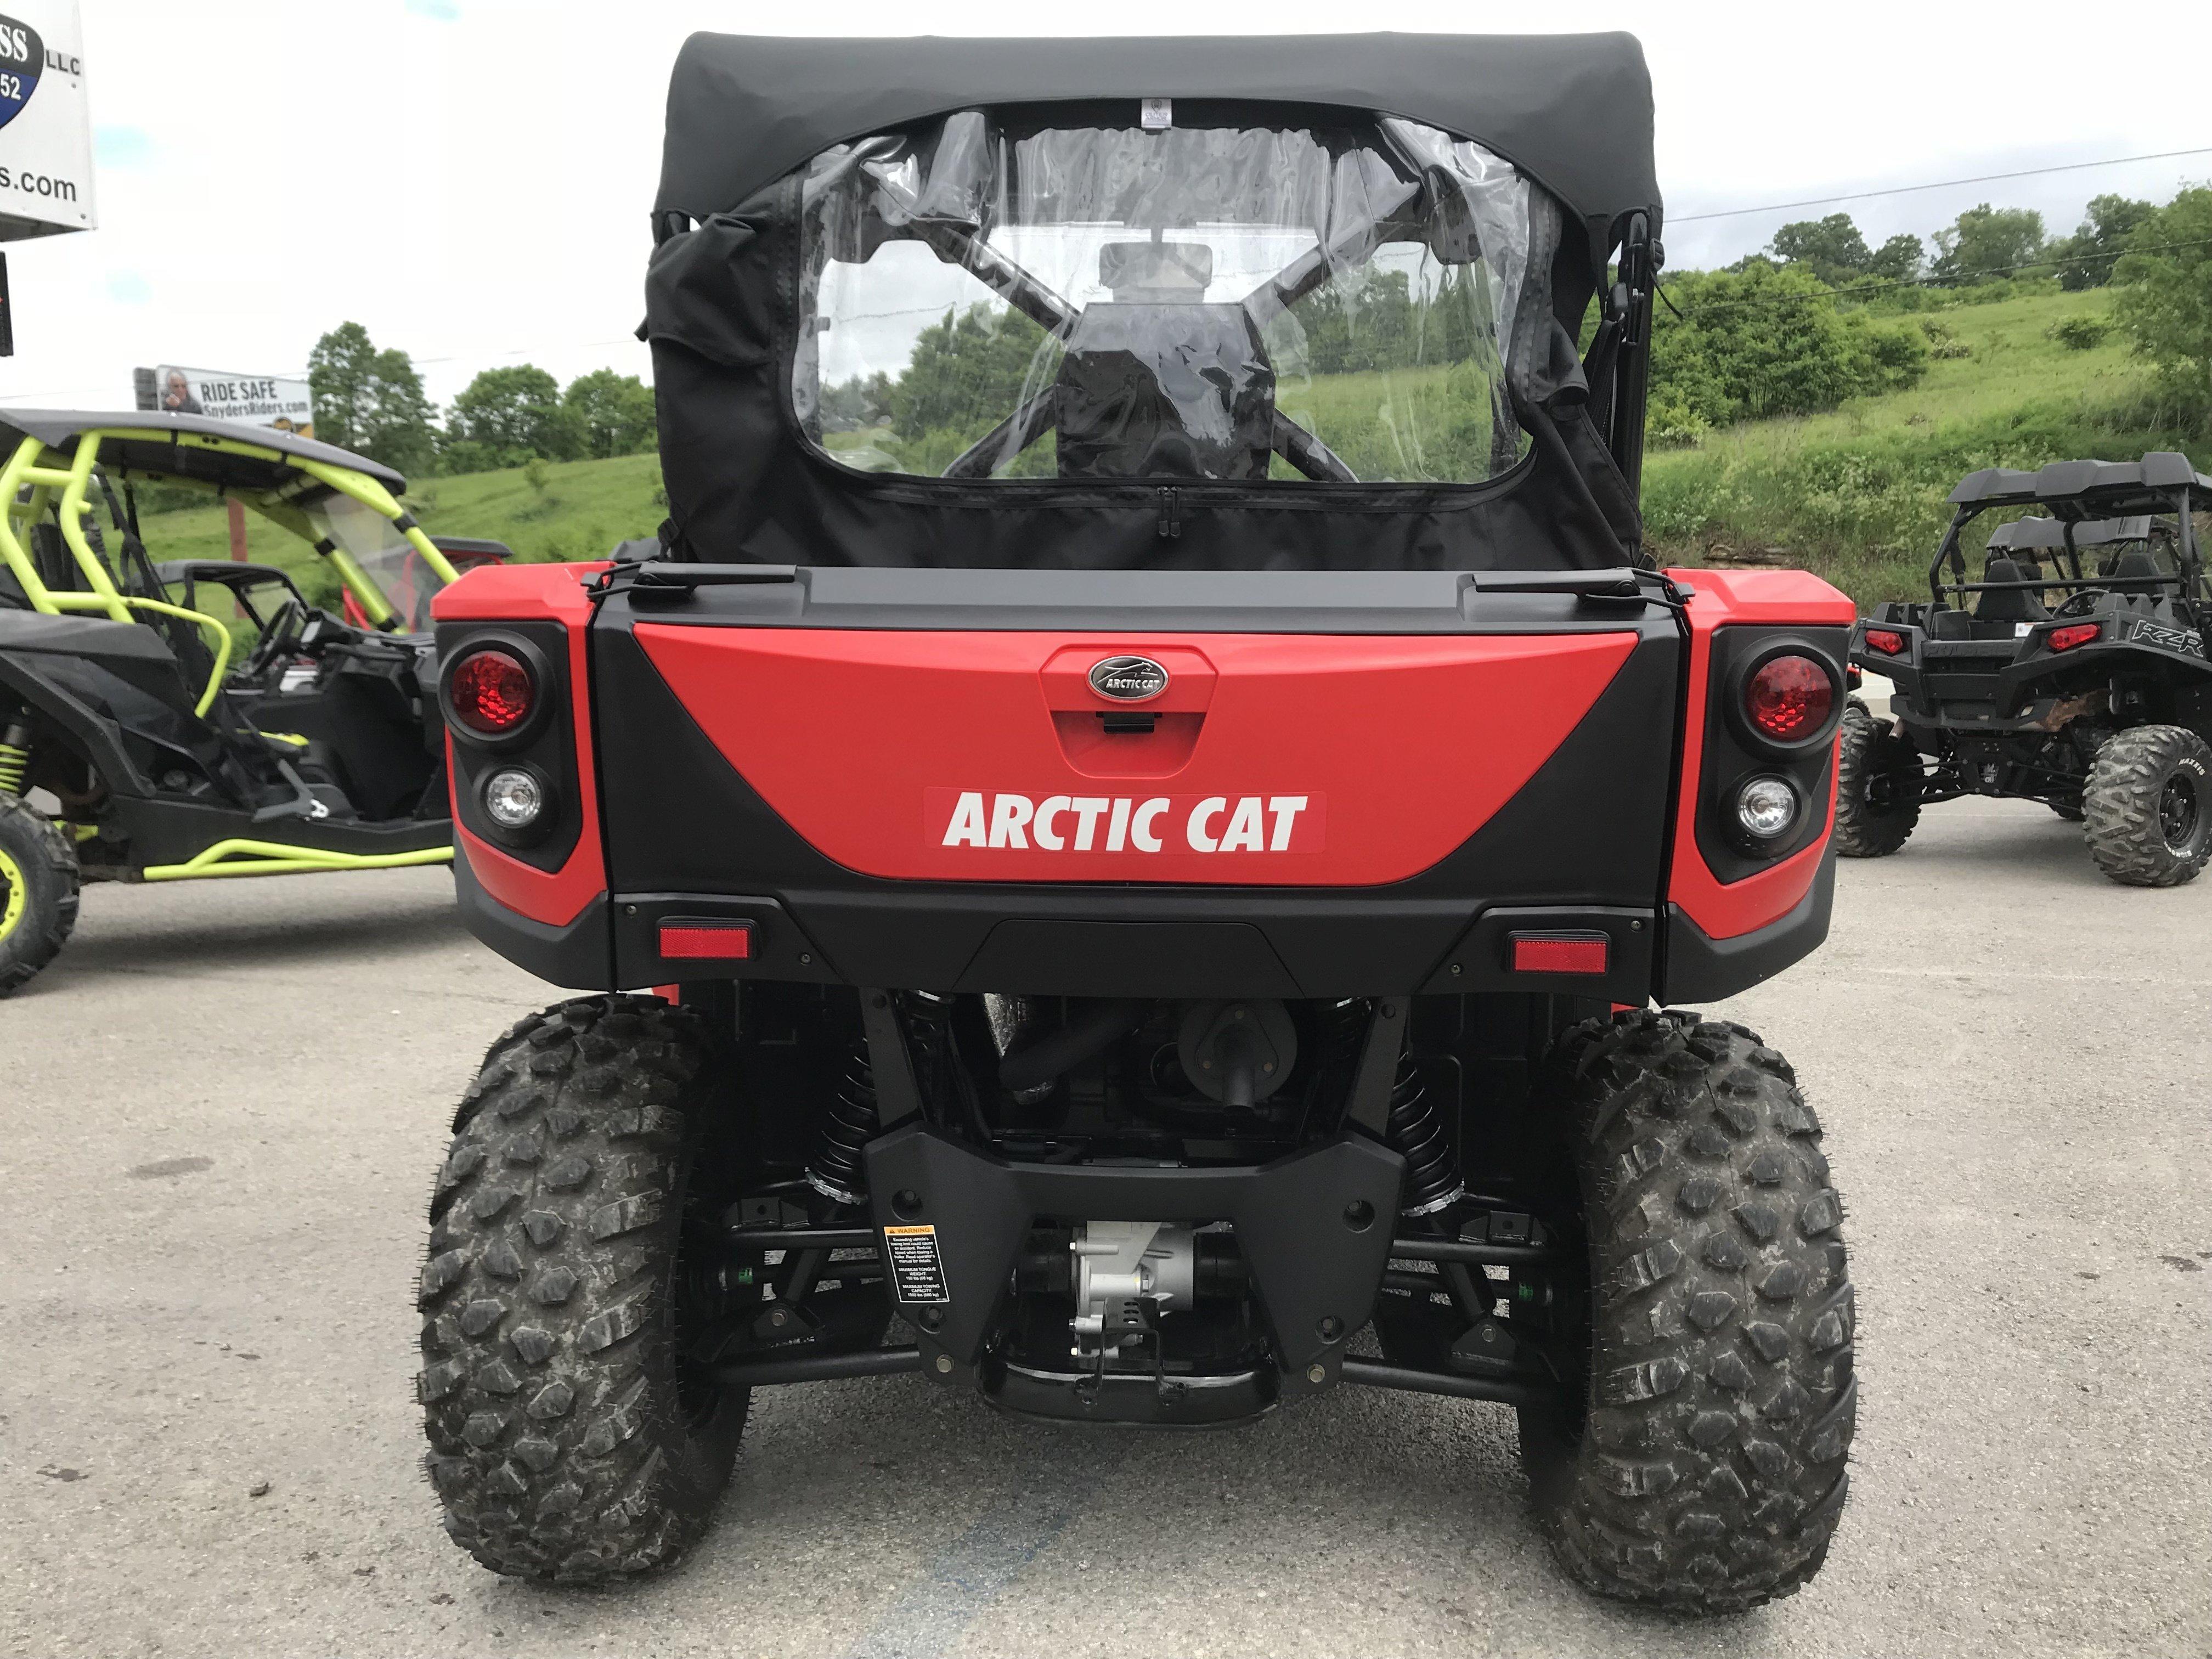 2017 Arctic Cat Prowler 500 - Like New 300 Miles